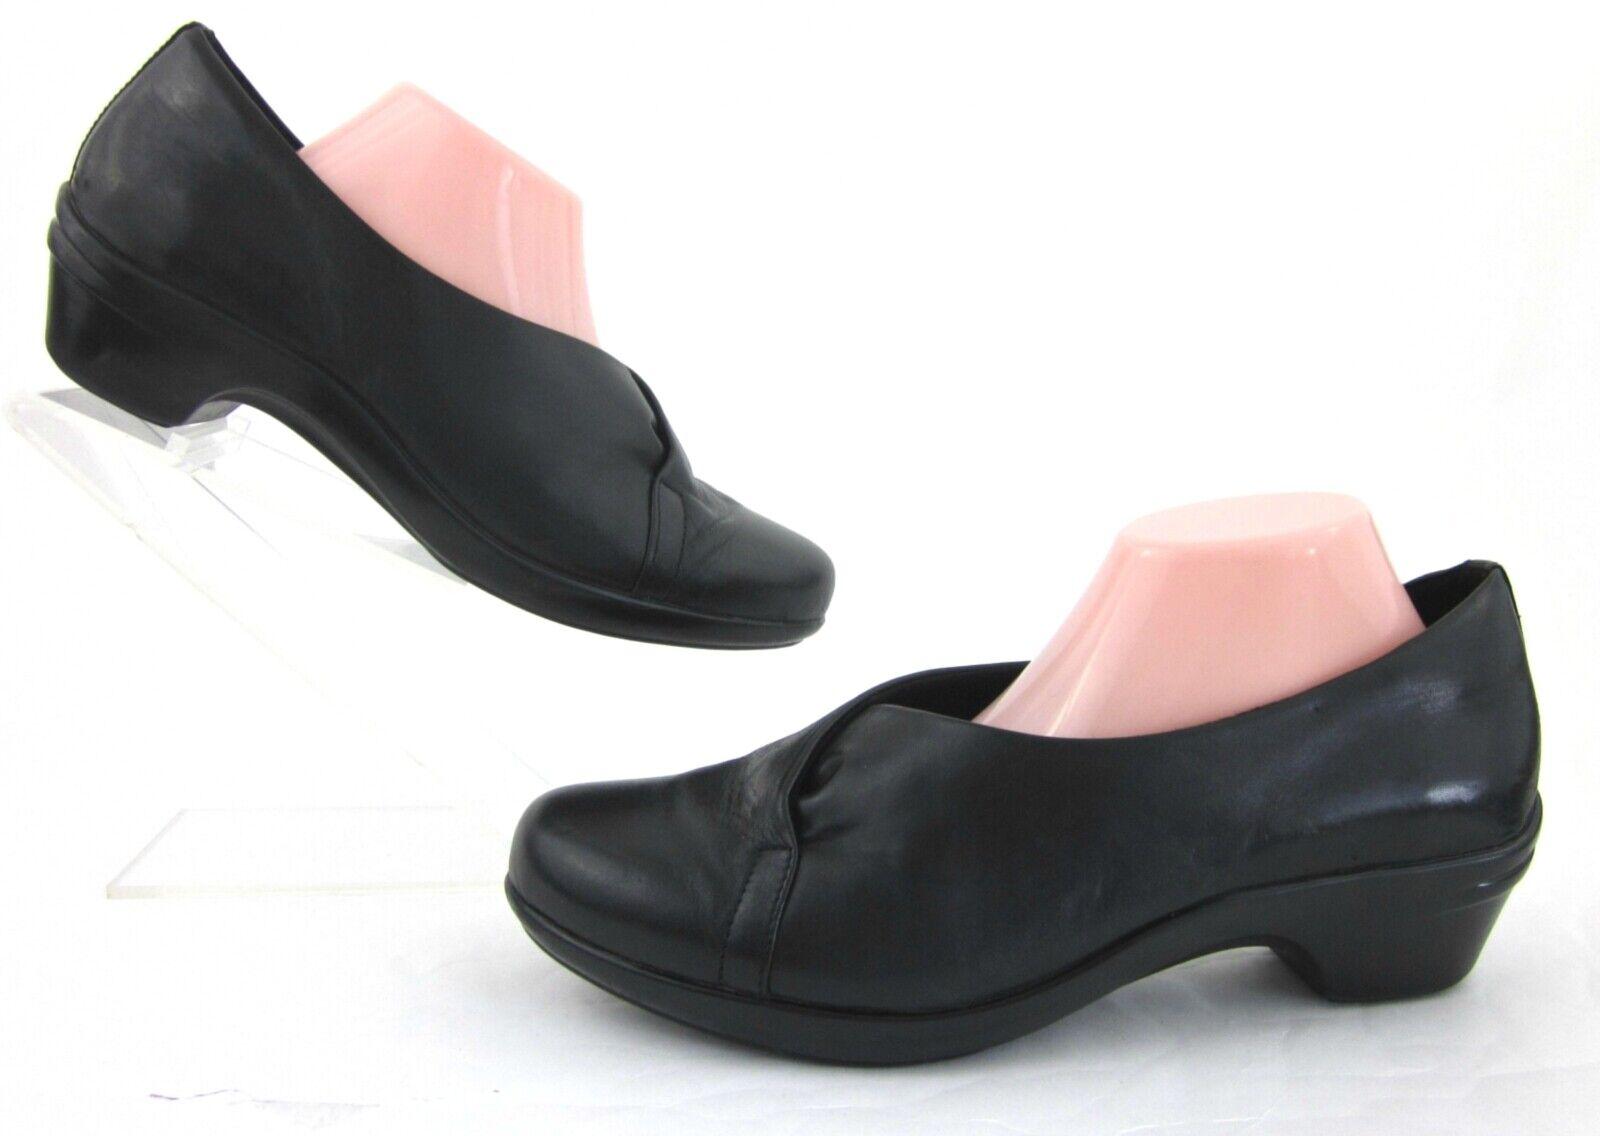 Aravon 'Kitt Asym' Low Heel Slip On Shoes Black Leather US 11 2E Extra Wide